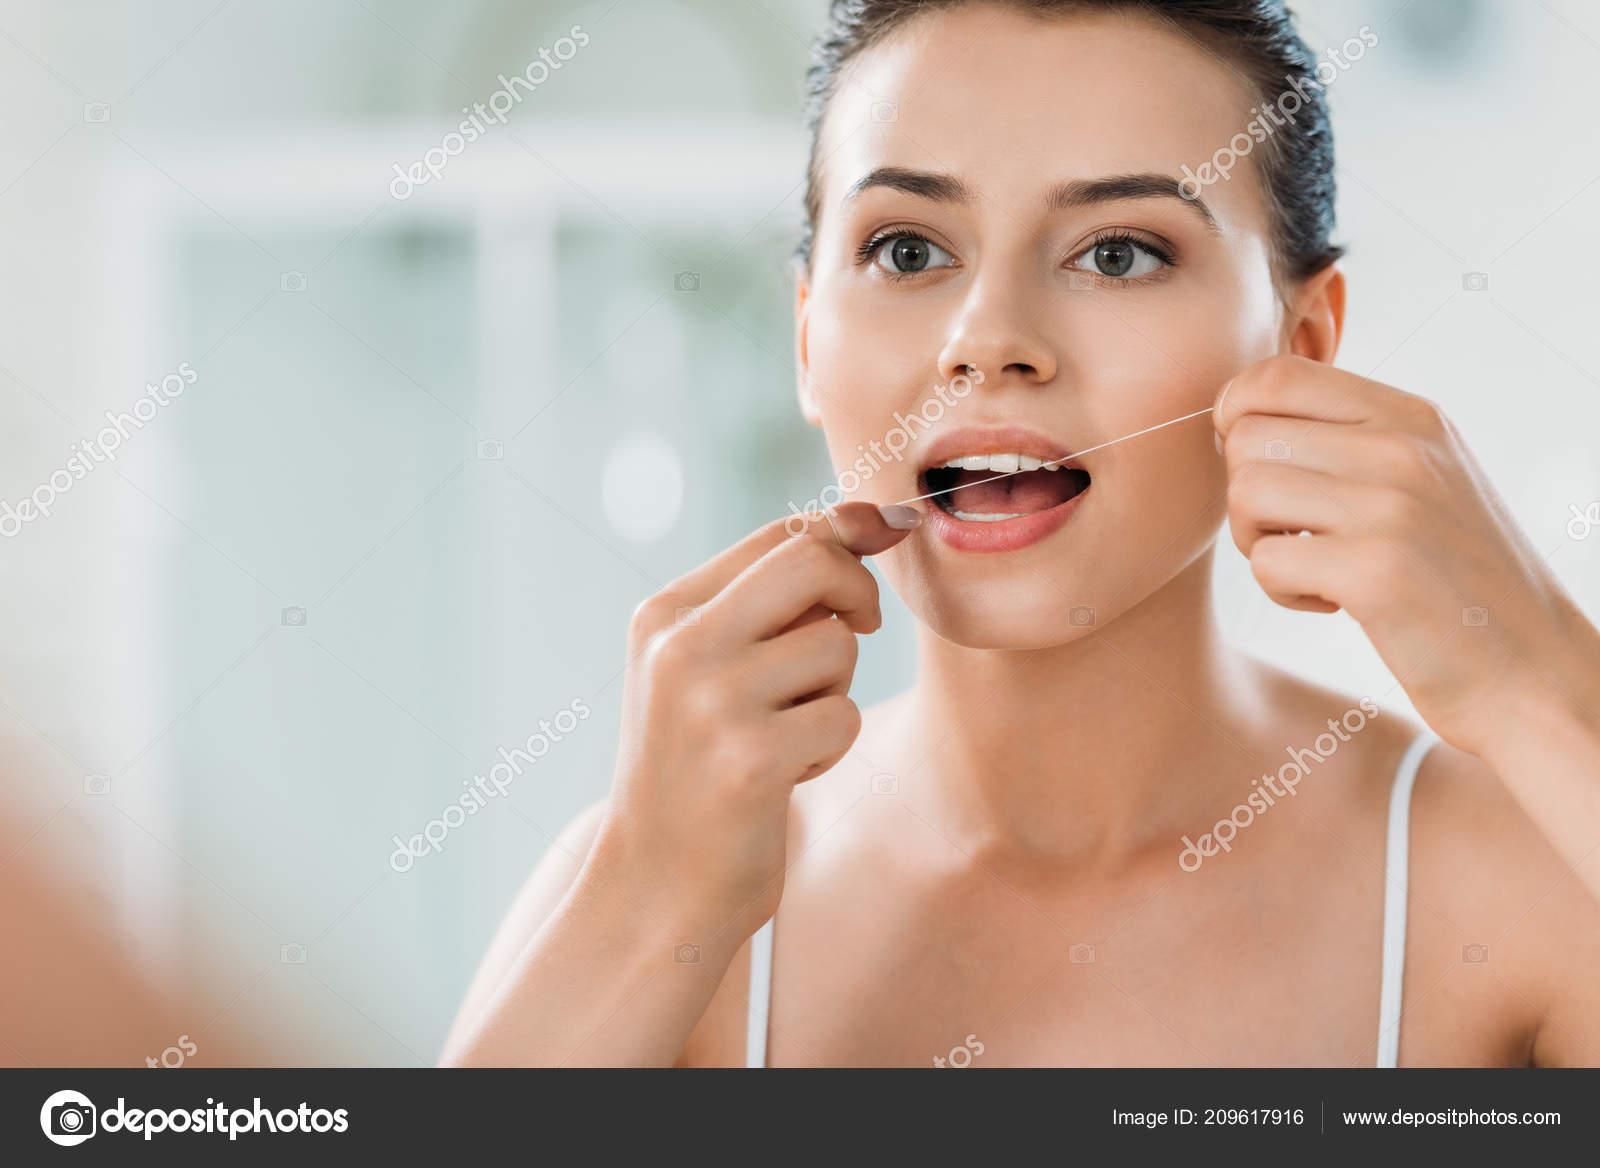 In Bathroom | Beautiful Young Woman Using Dental Floss Bathroom Fotos De Stock